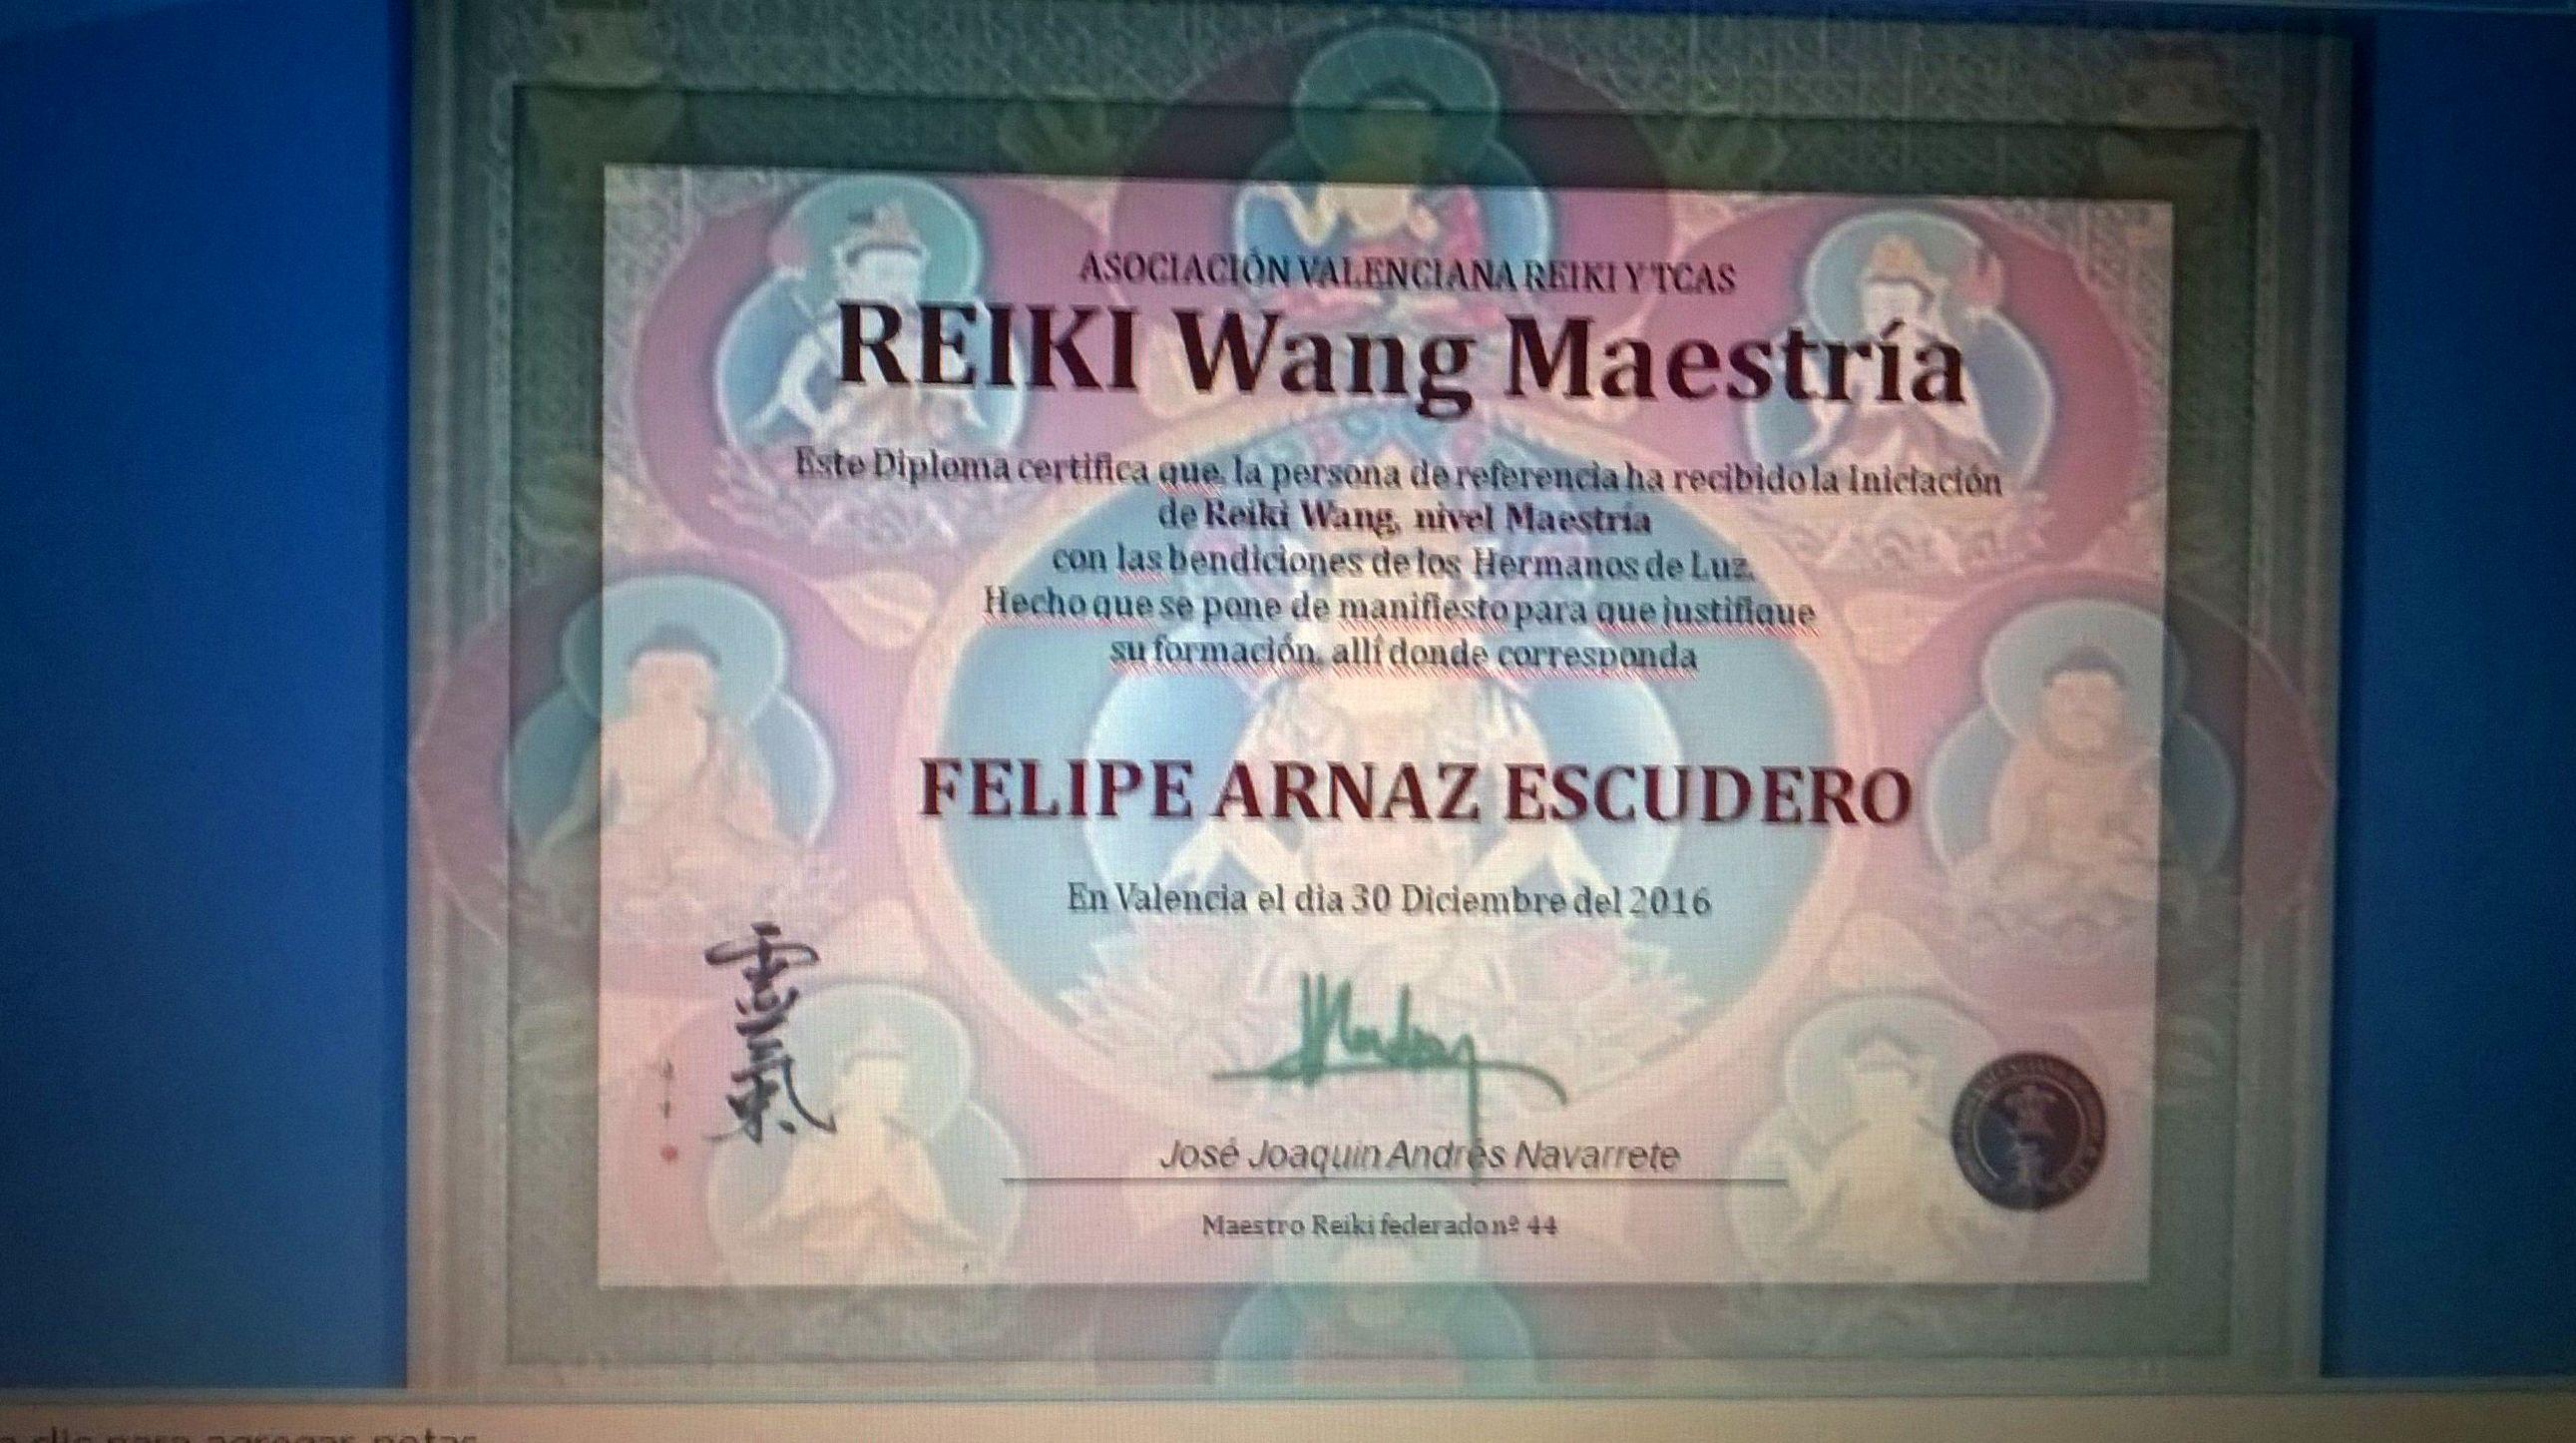 Diploma: Reiki Wang Maestria